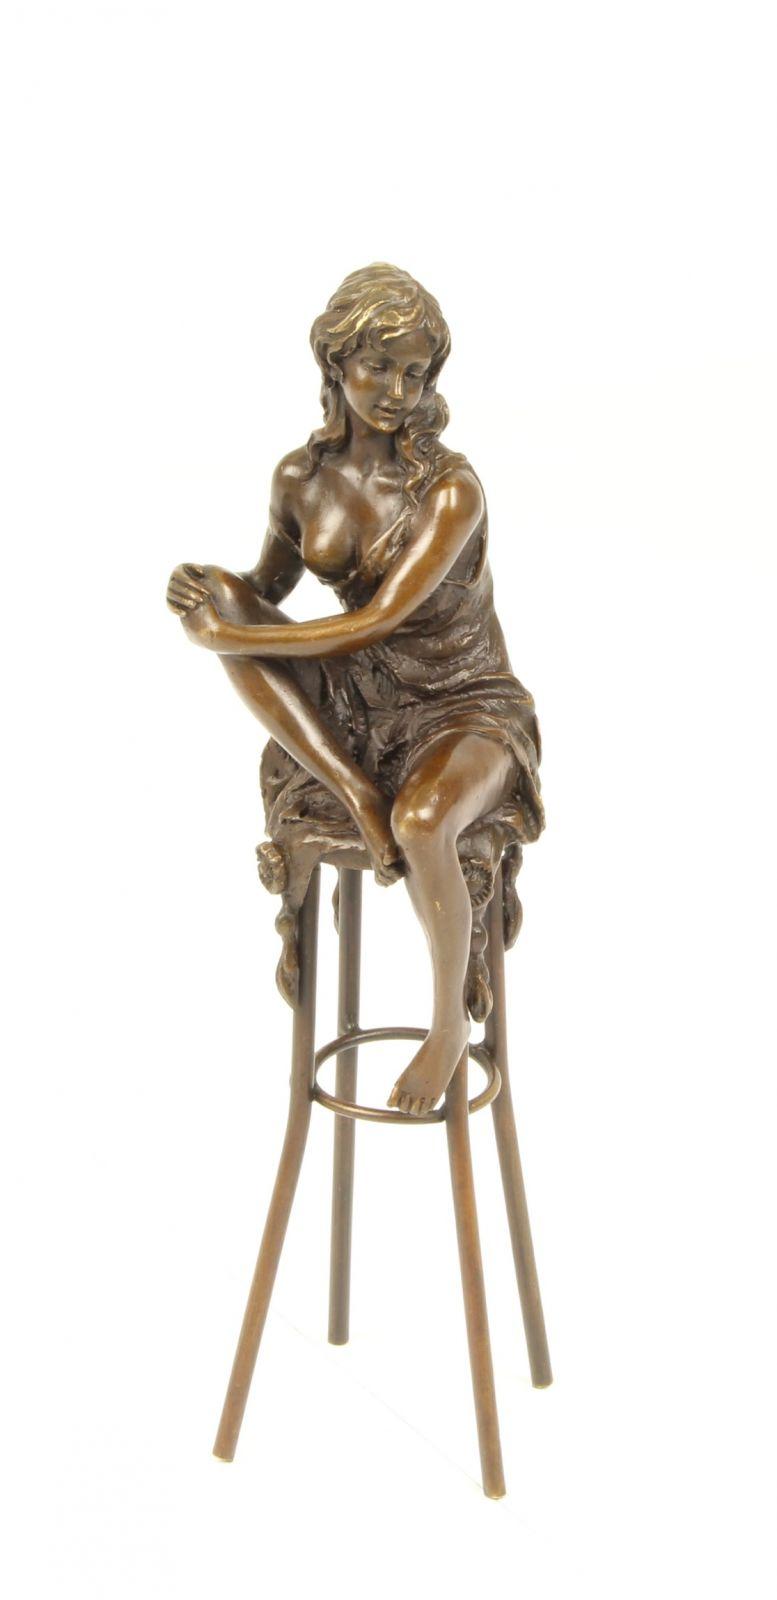 Bronzová nahá žena na barové židle